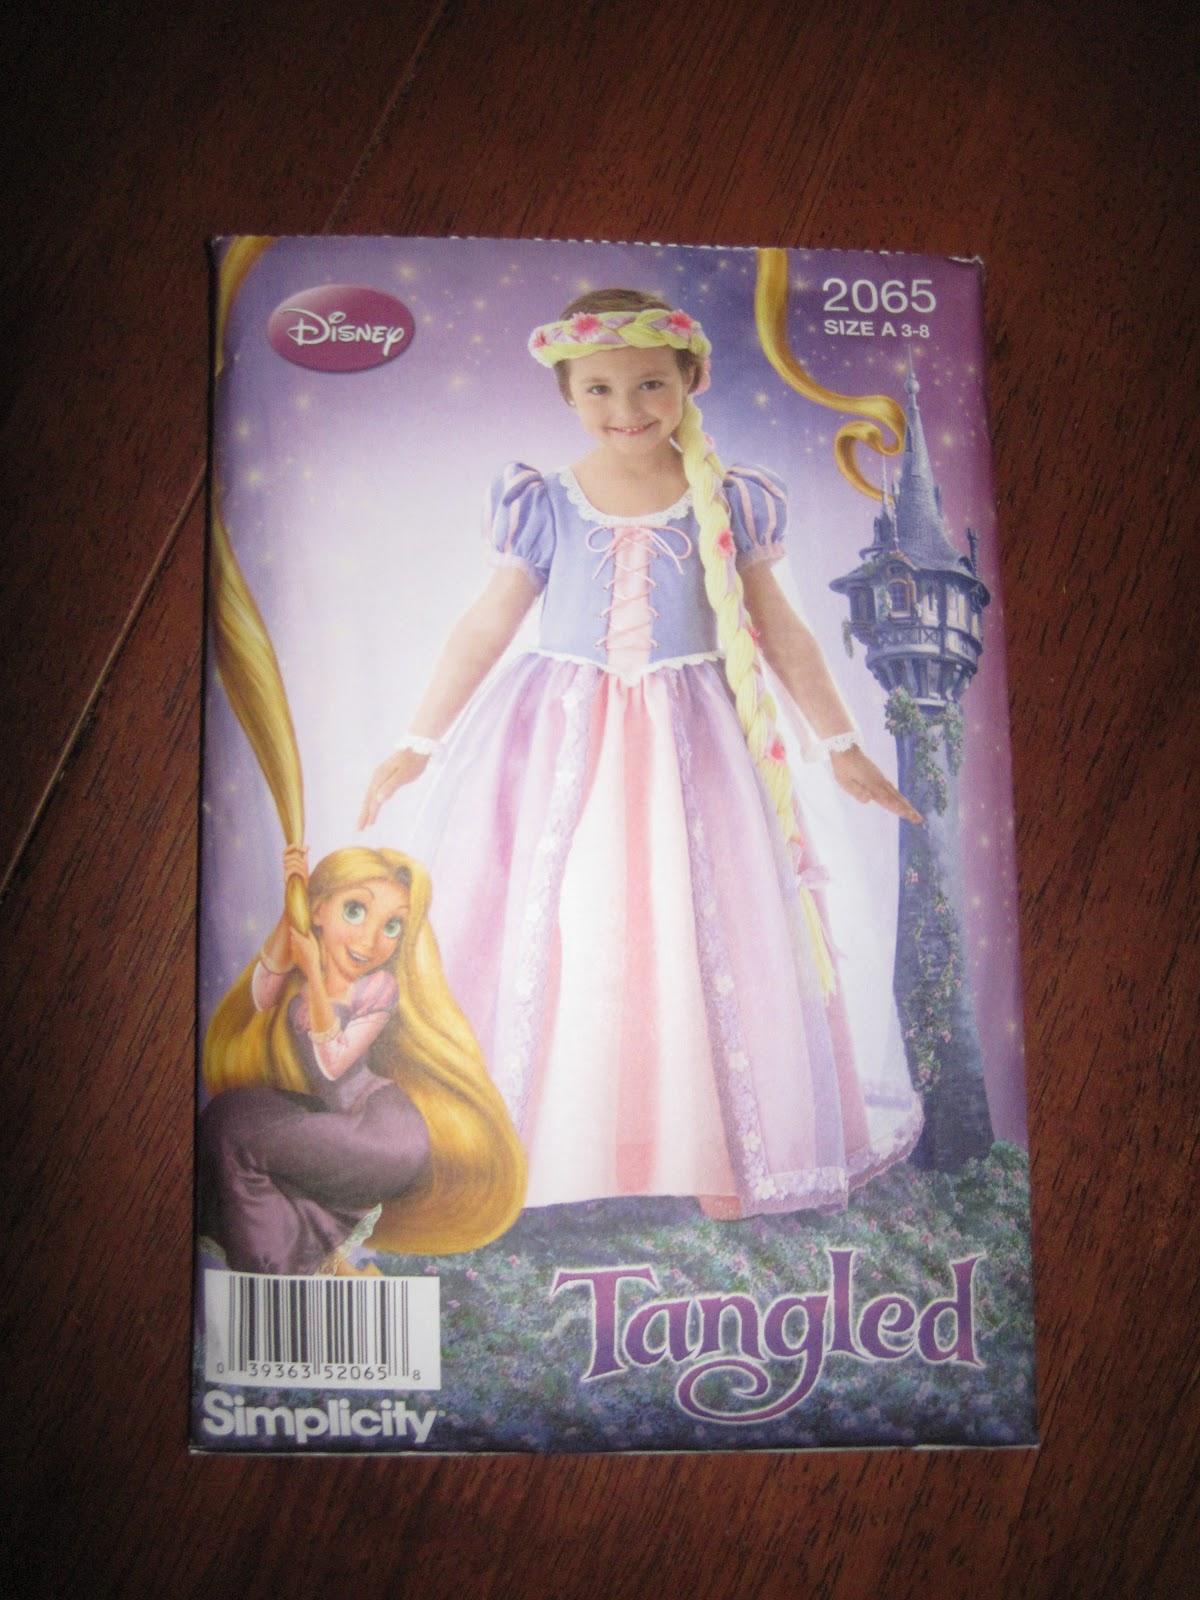 Simplicity Pattern 2065, Disney Rapunzel Dress - Sew Much